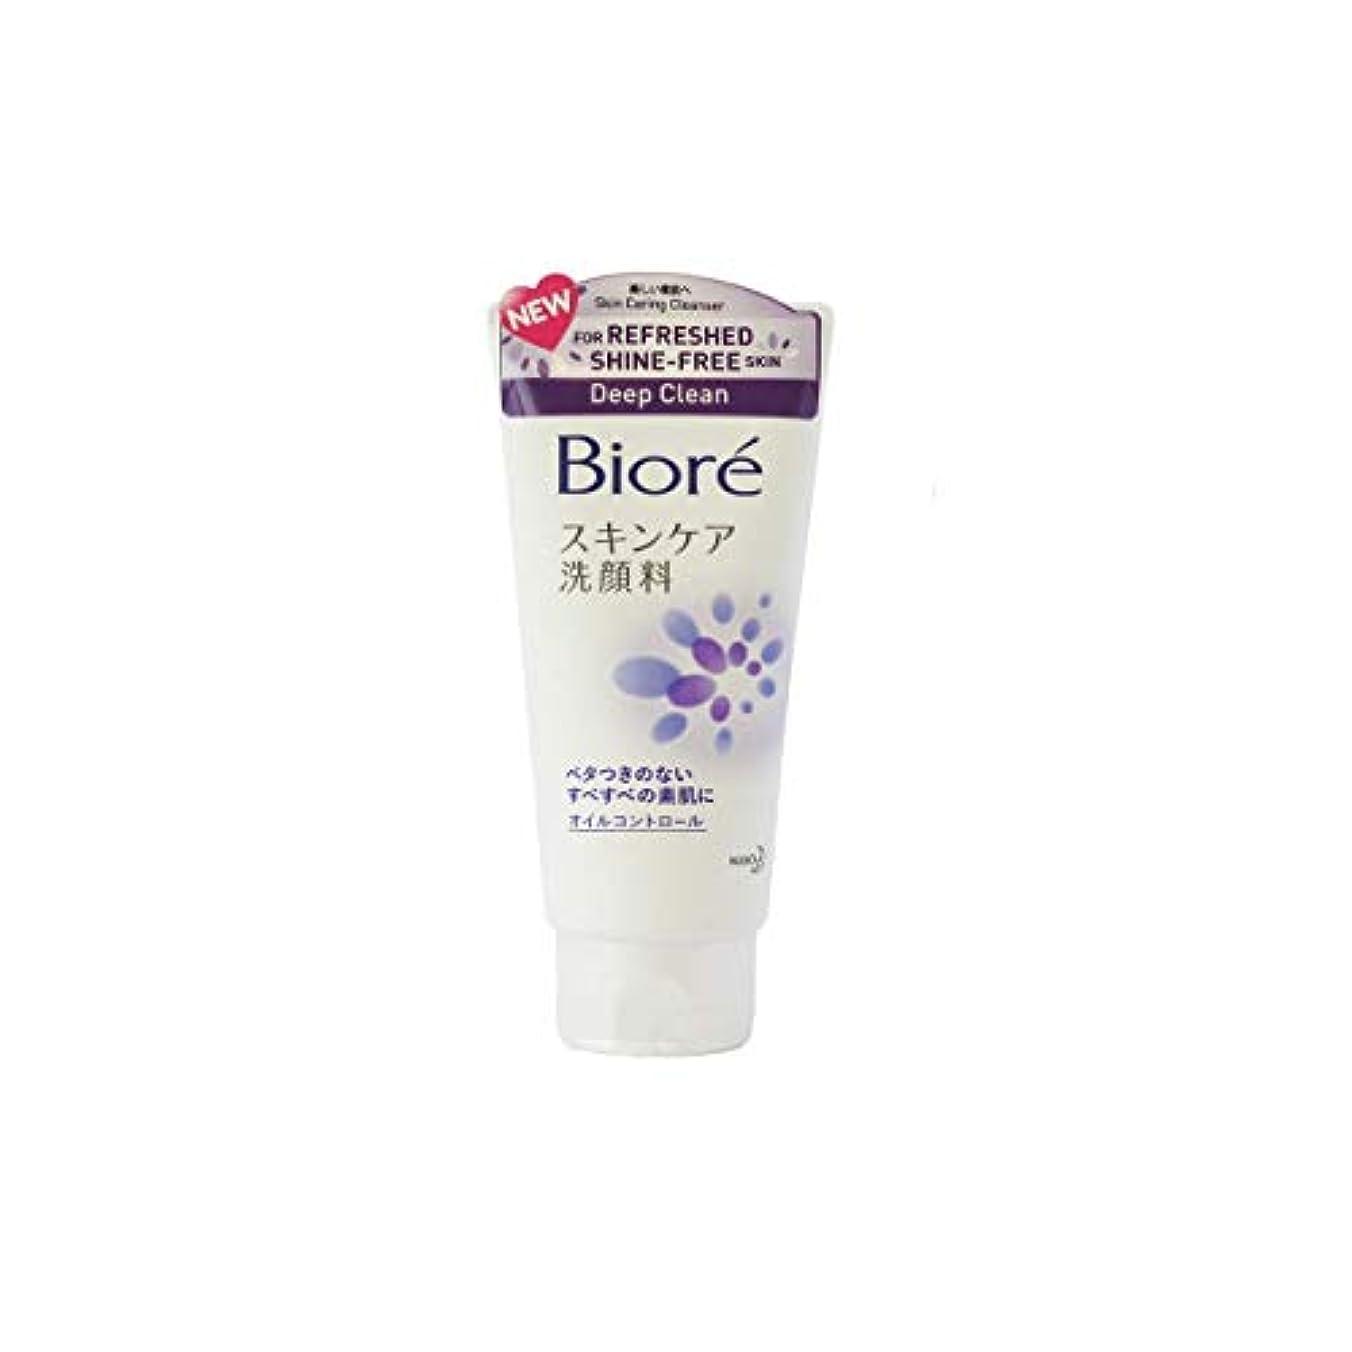 BIORE UV ビオレ皮膚洗浄剤オイルコントロール親密な130グラム